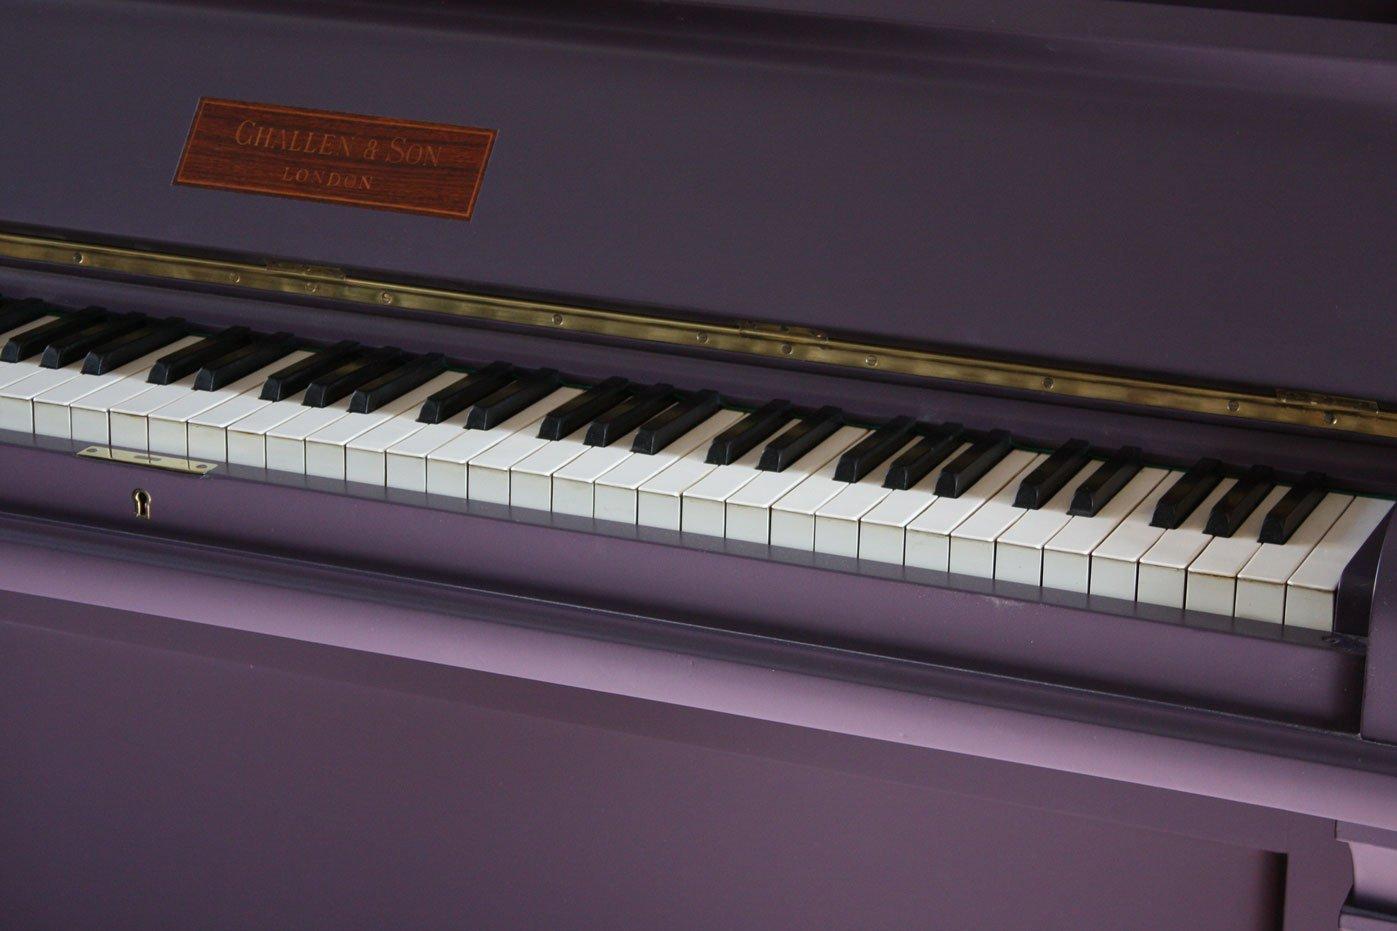 Kawai ES110 Digital Piano